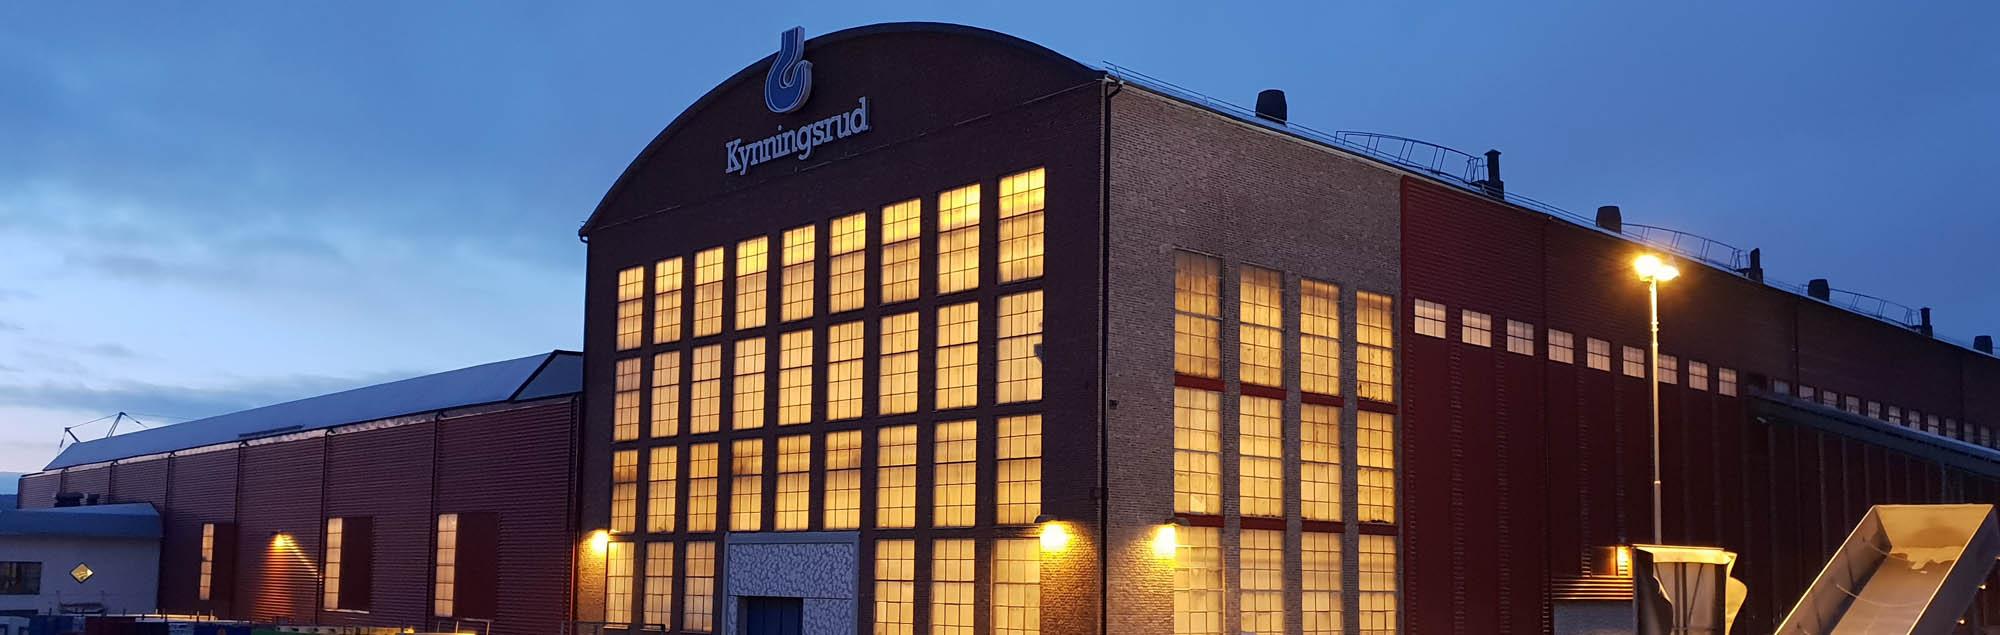 HeidelbergCement acquires Kynningsrud Prefab